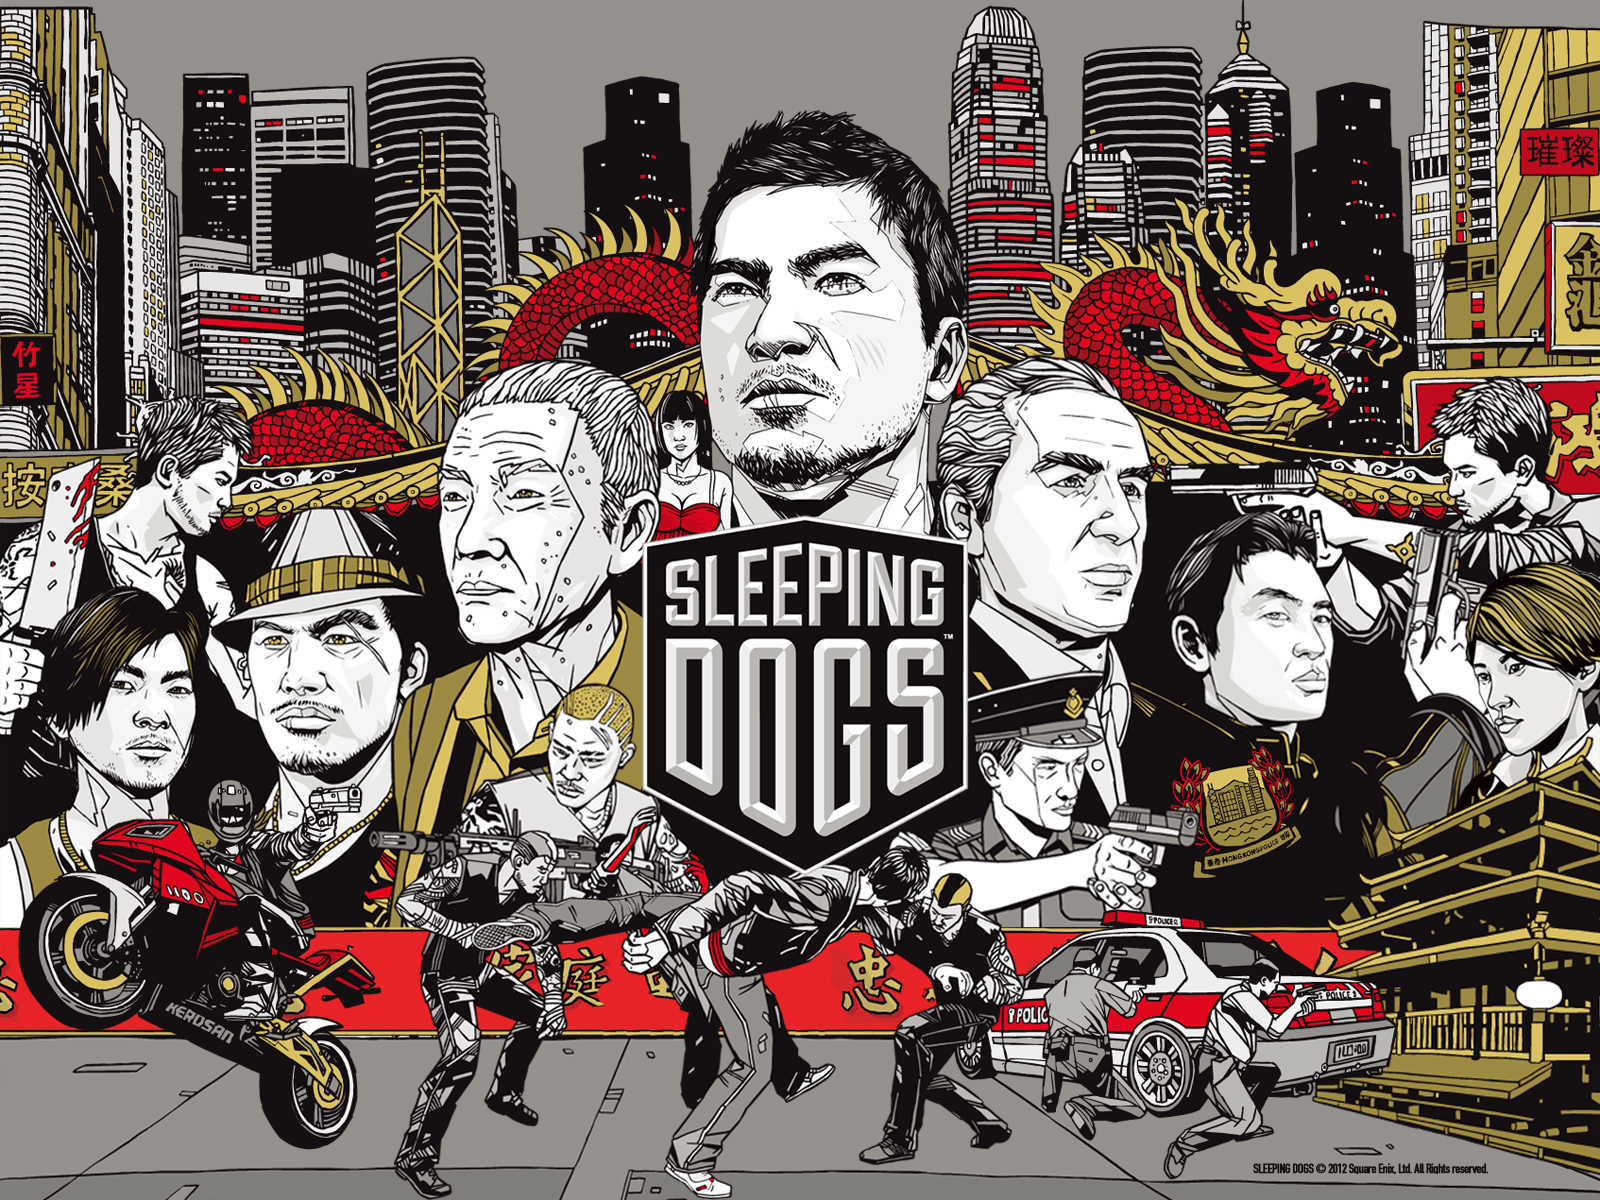 Sleeping-Dogs-Promo-Art.jpg